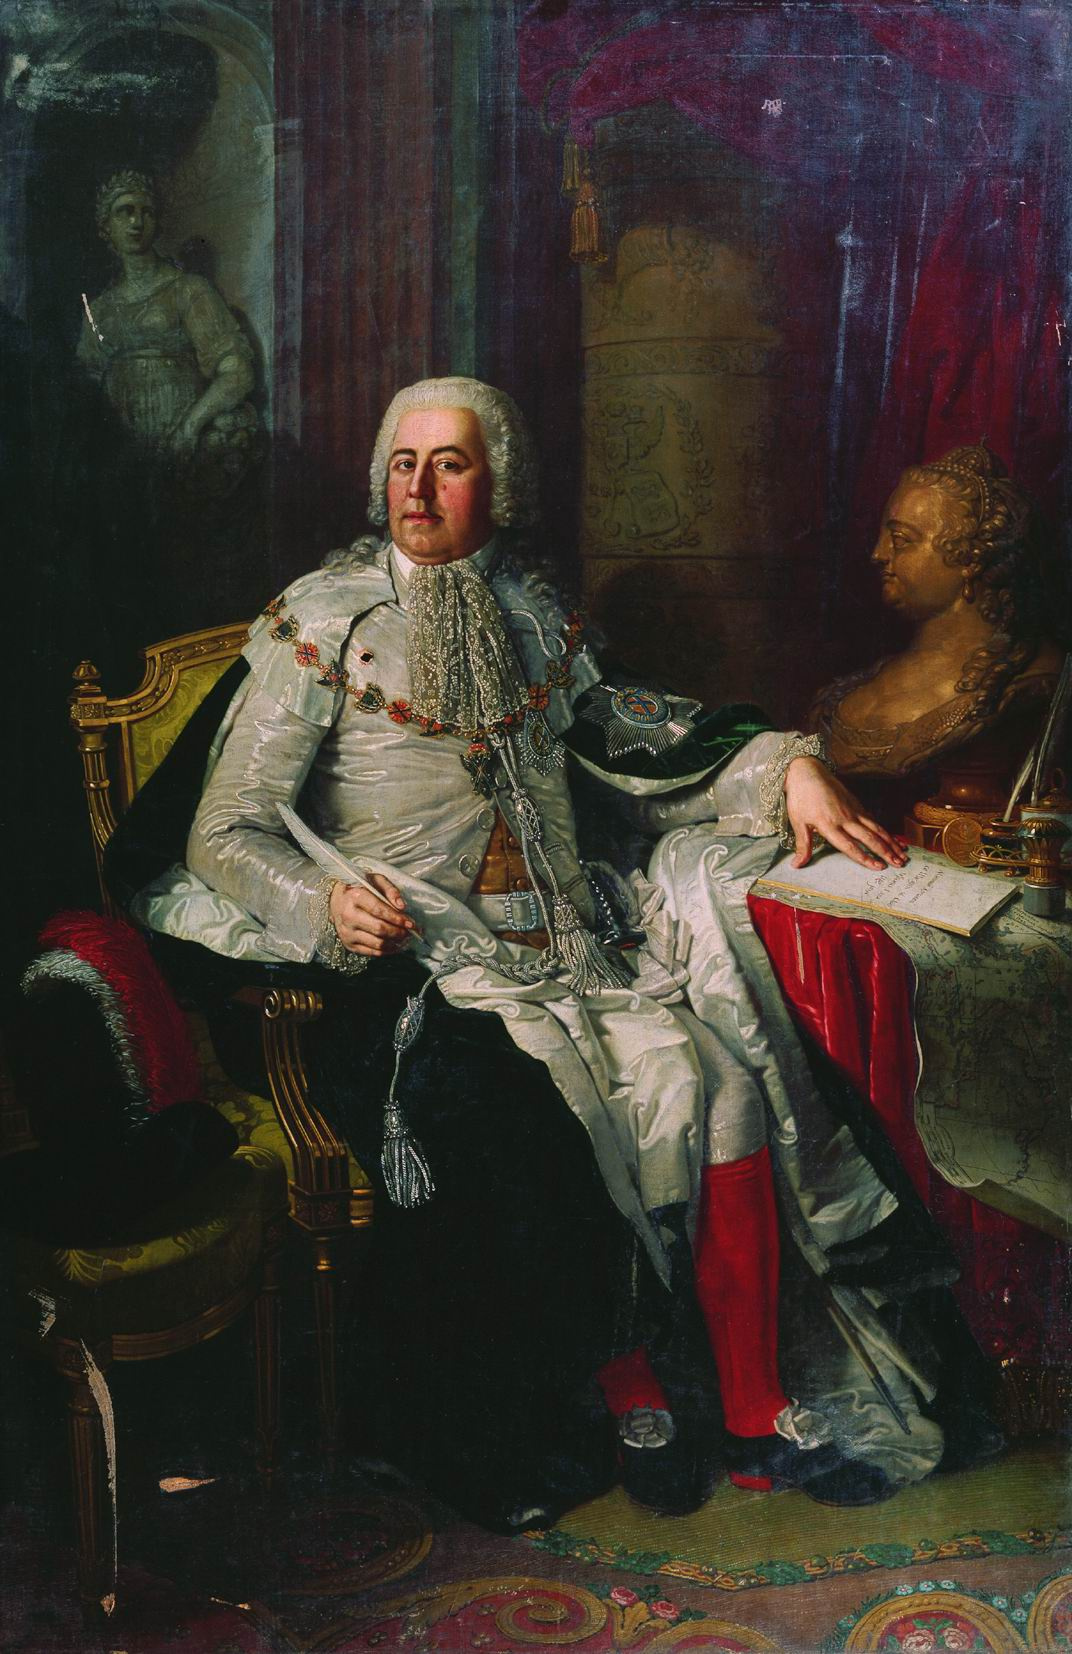 Vladimir Borovikovsky. Portrait of an associate of Peter I Alexander Ivanovich Rumyantsev